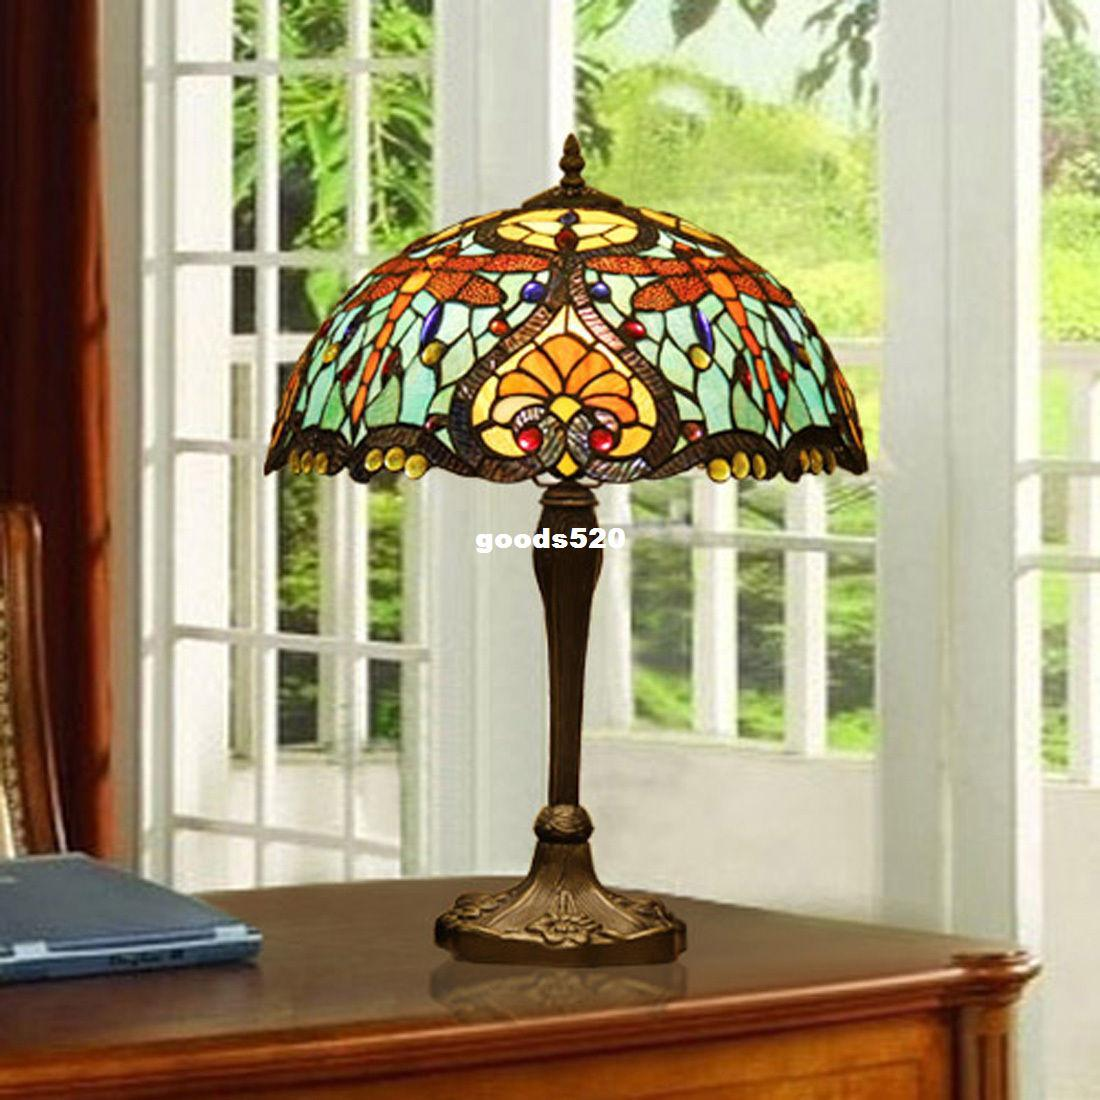 Vitrail Vintage Libellule Clair De Grande Bleu Makenier Style Table Lampe En Tiffany XOkiPZuT